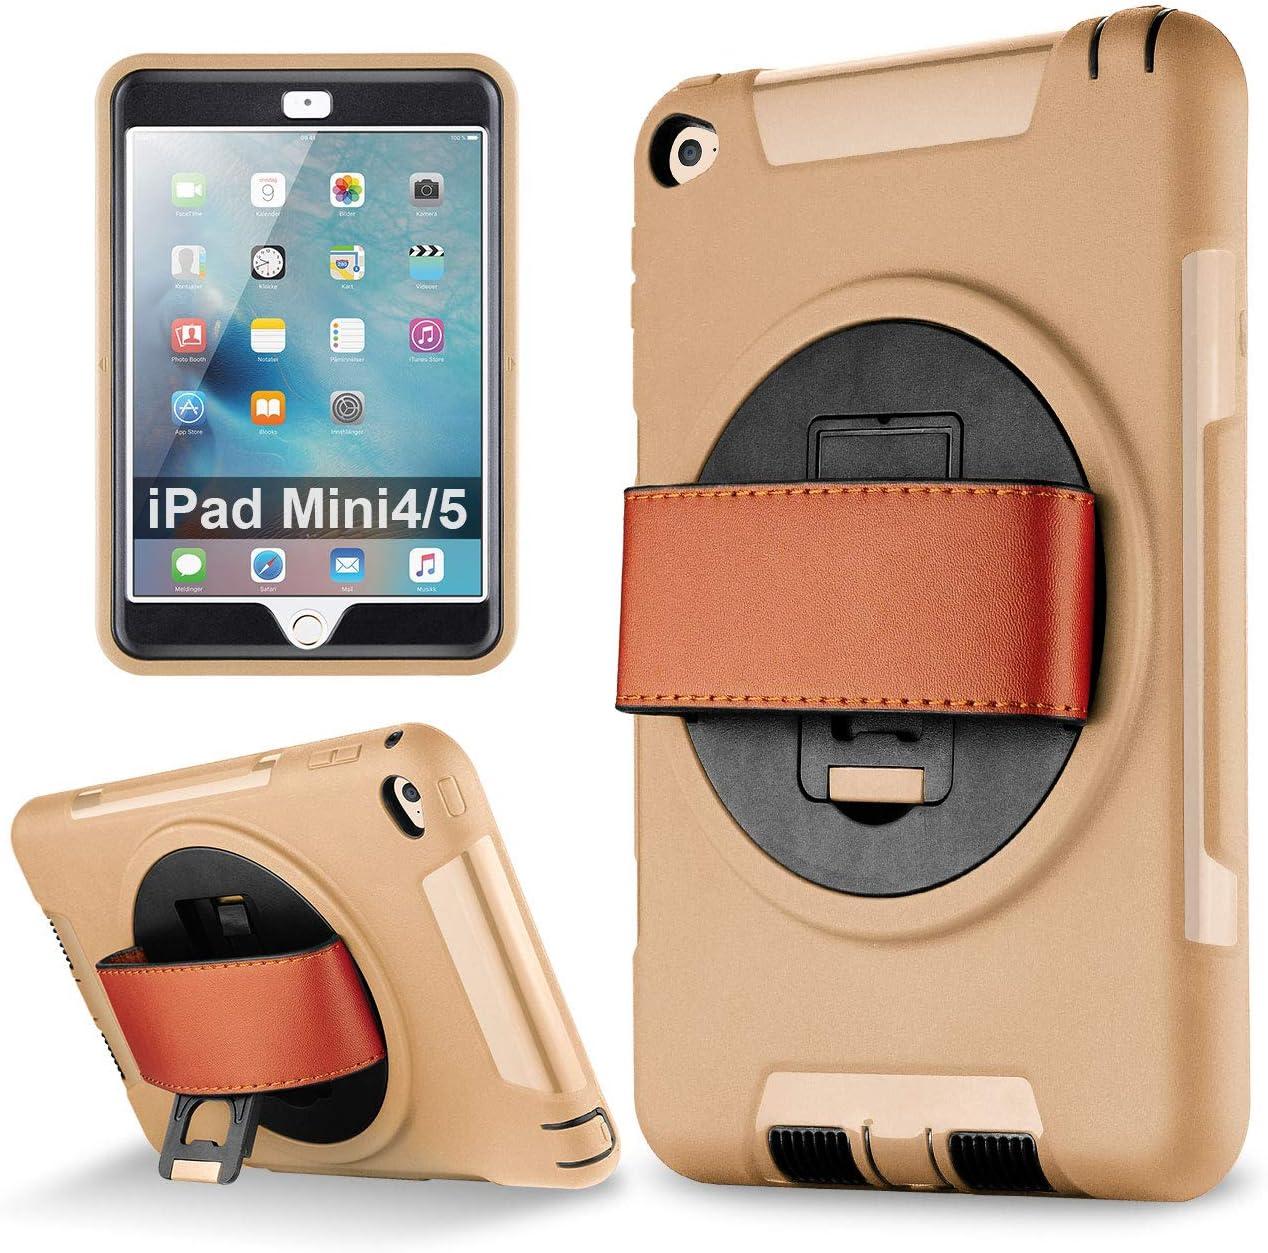 iPad Mini 5, iPad Mini 4 case, eSamcore Shockproof 360 Degree Rotating Leather Handle Grip and Kickstand Case with Built in HD Screen Protector for Apple iPad Mini 4 and iPad Mini 5 [Gold]